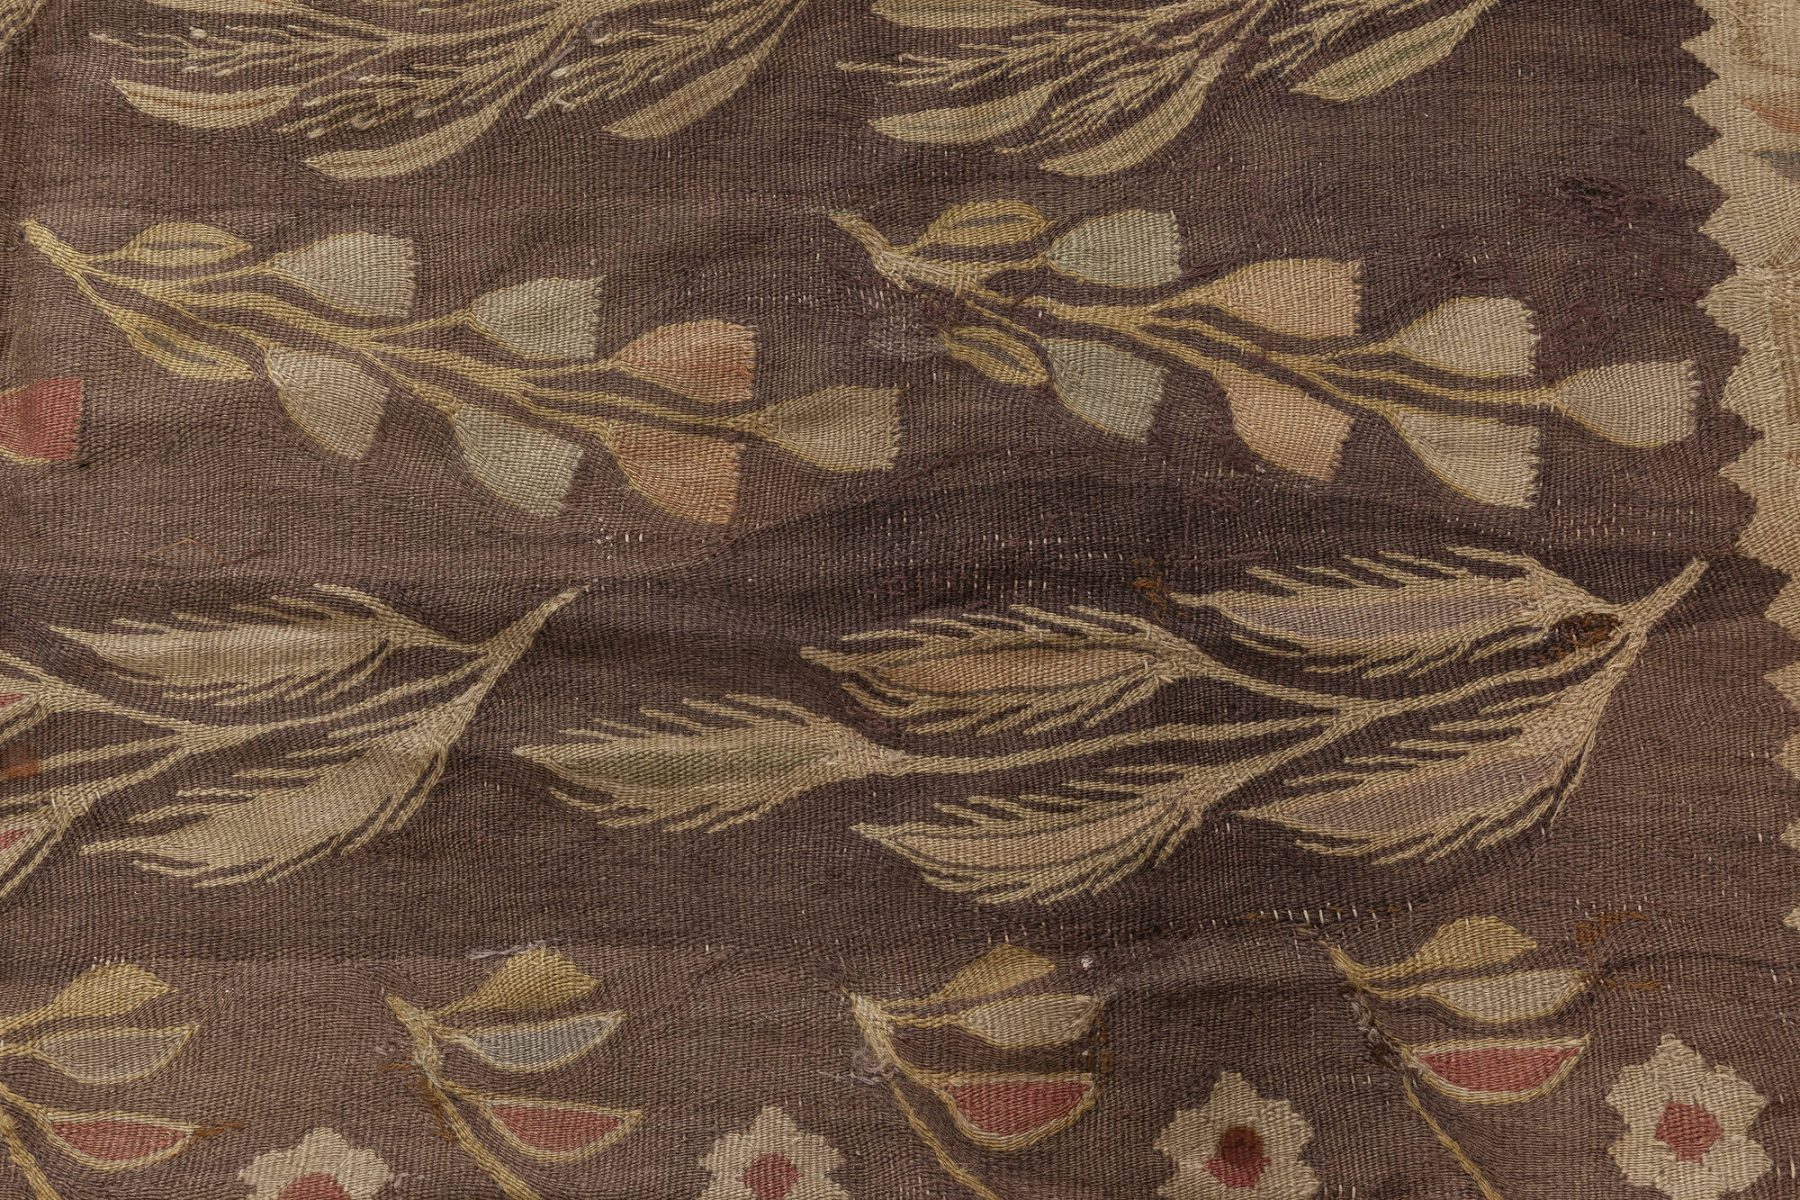 Antique Bessarabian Burgundy, Brown and Beige Handwoven Wool Rug BB6919